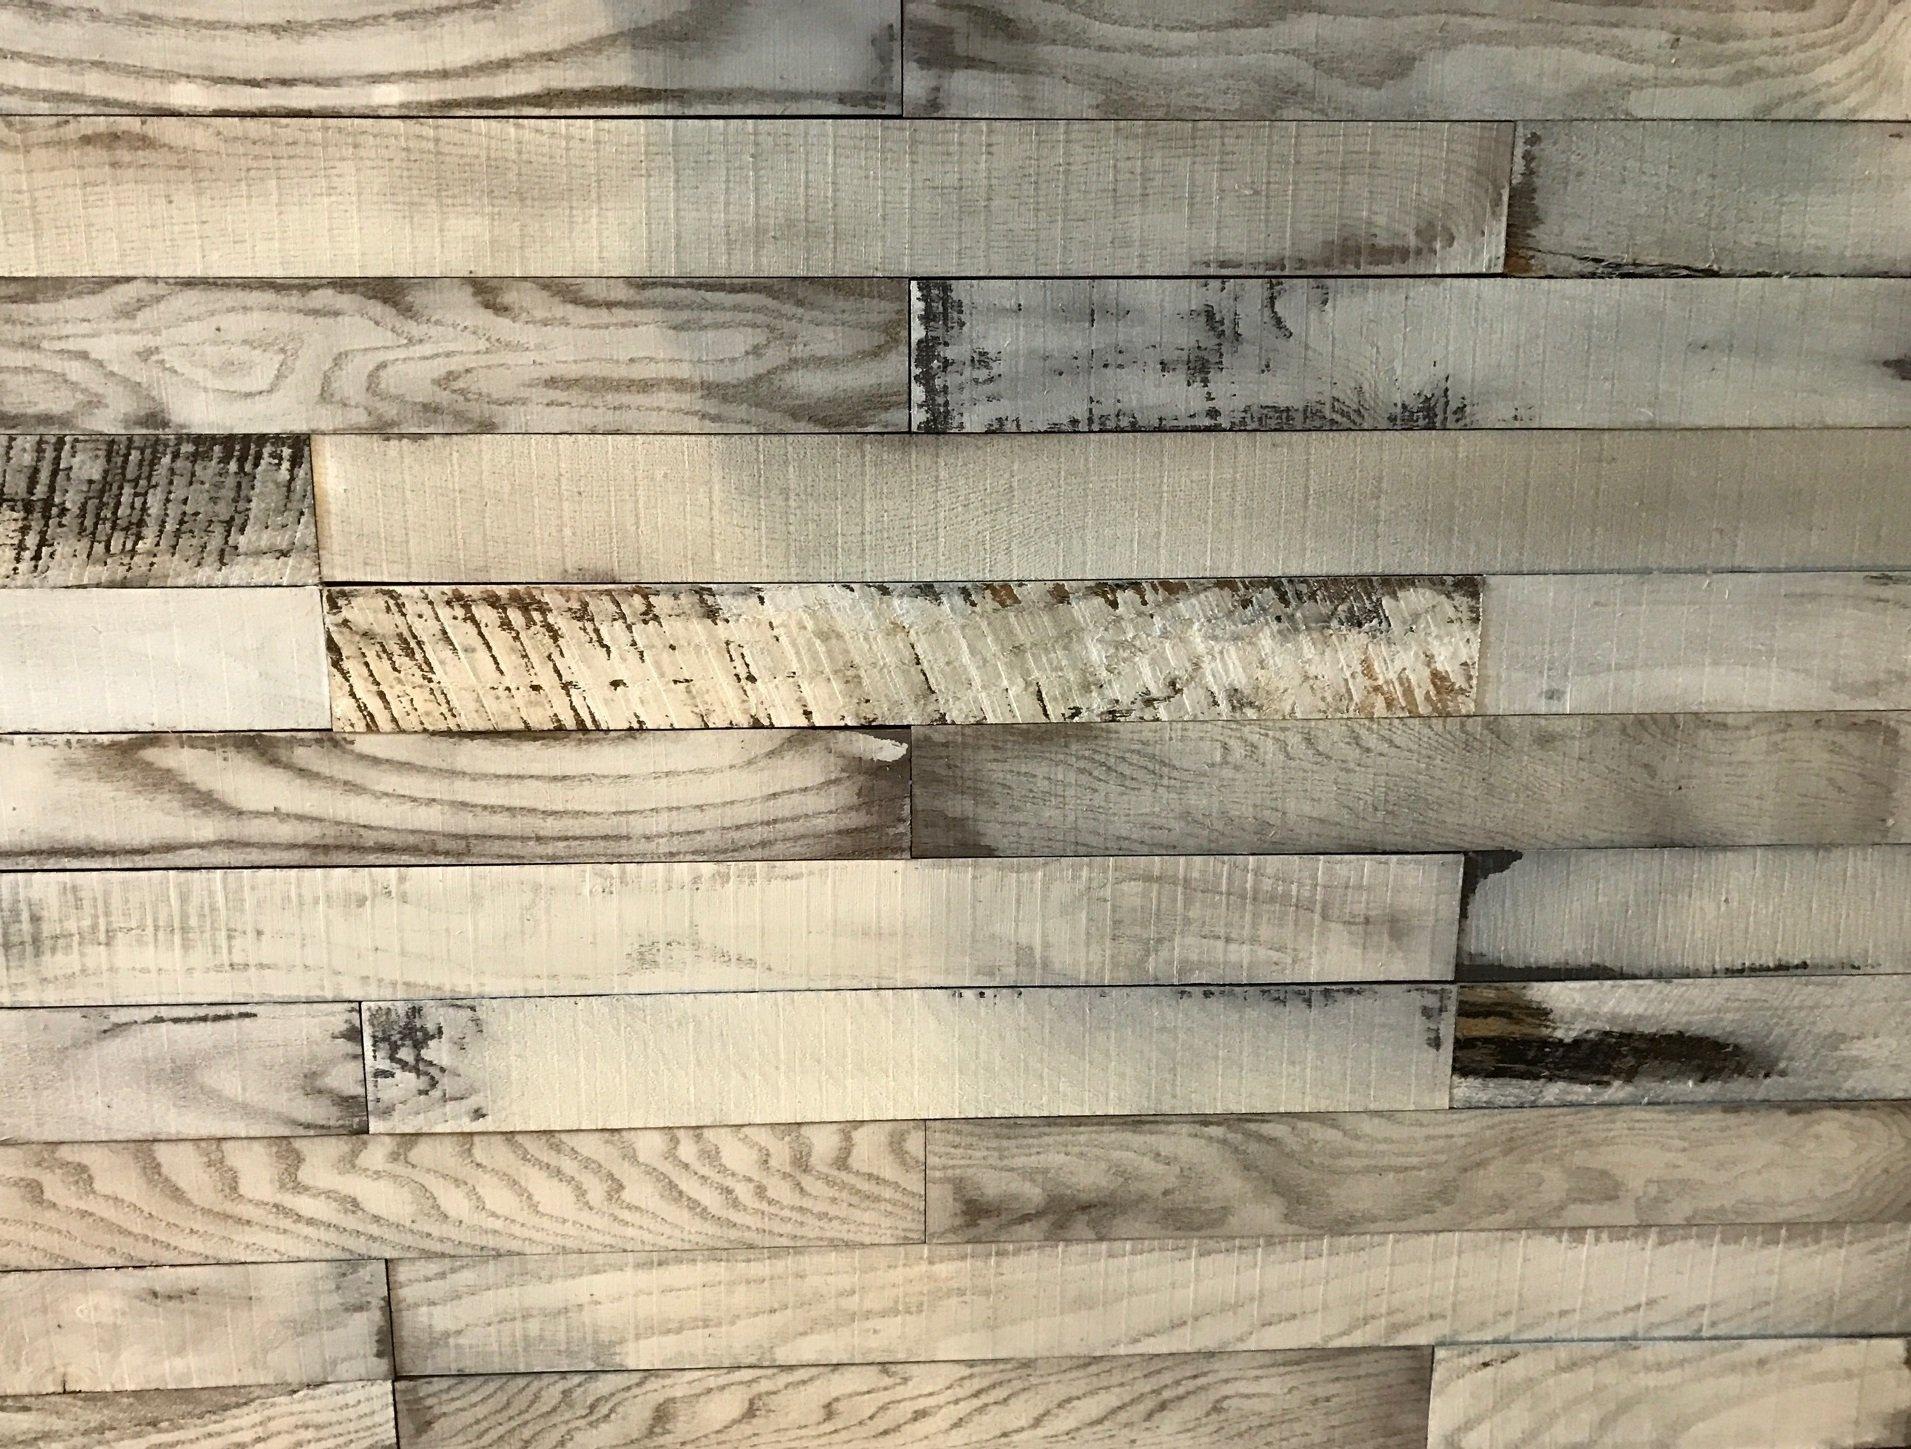 macLEDs PLANK-20SF-whitewash Hardwood Wall Planks 20 Sq.'. Distressed Whitewashed Wood Wall Planks